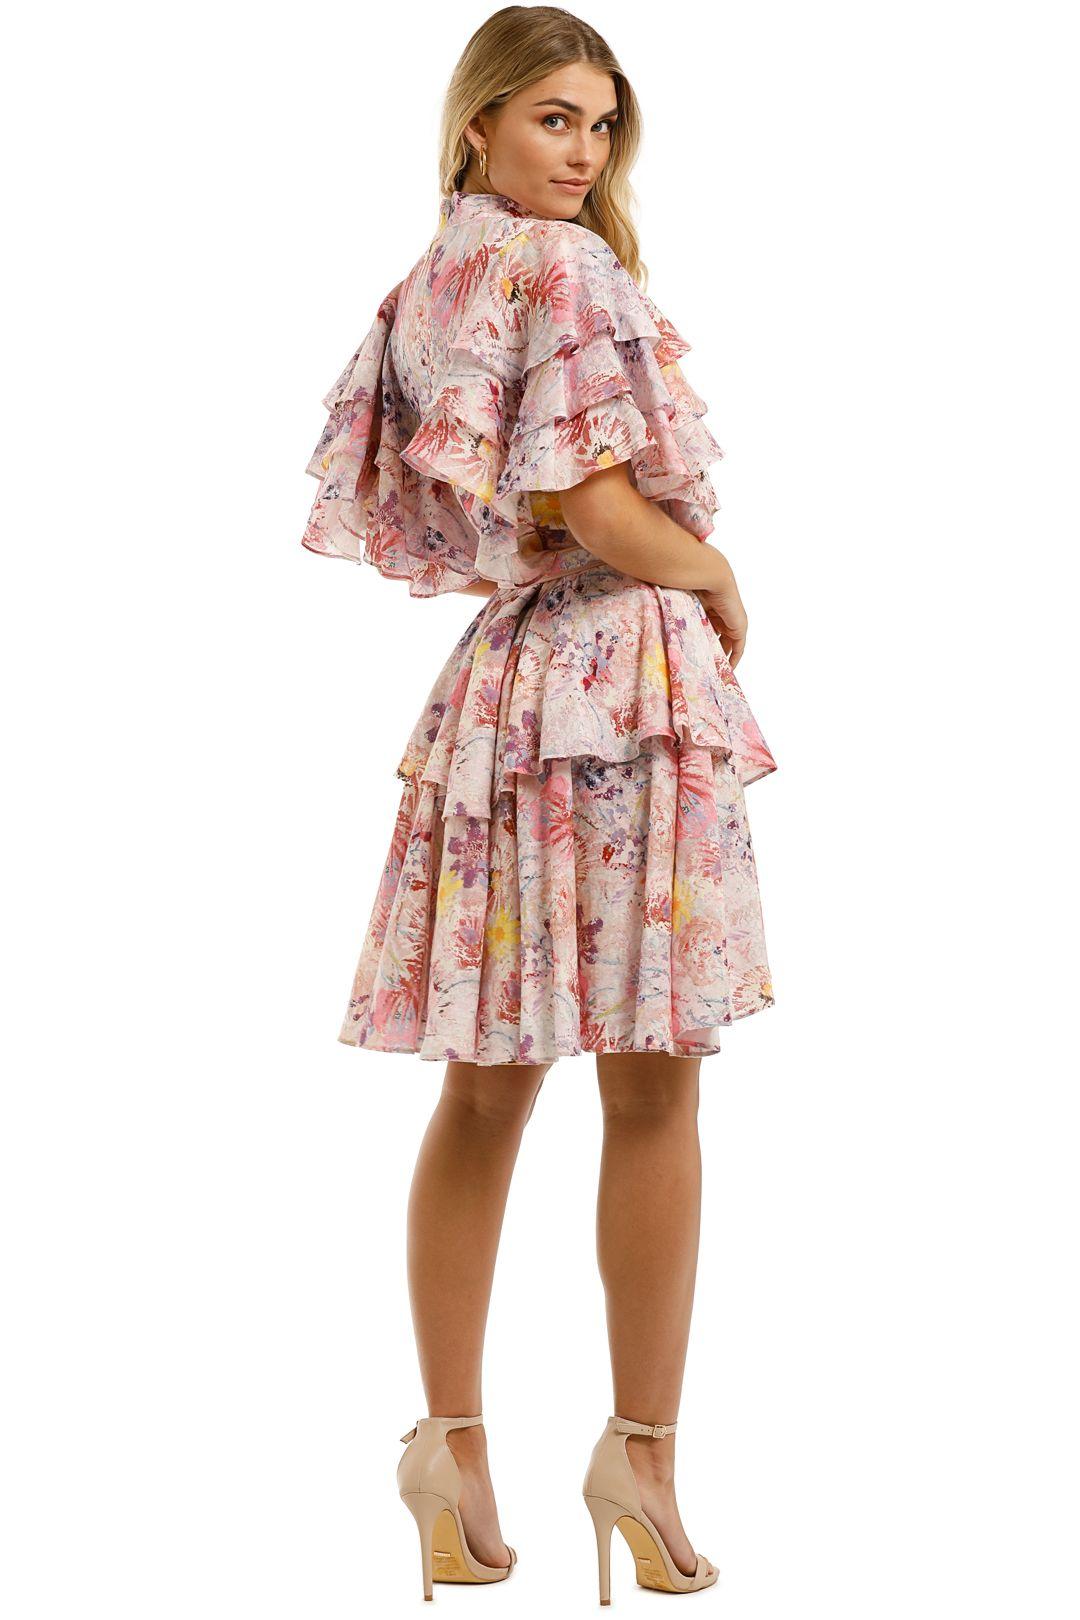 Leo-and-Lin-Euphoria-Cotton-Linen-Ruffled-Mini-Dress-Blush-Back